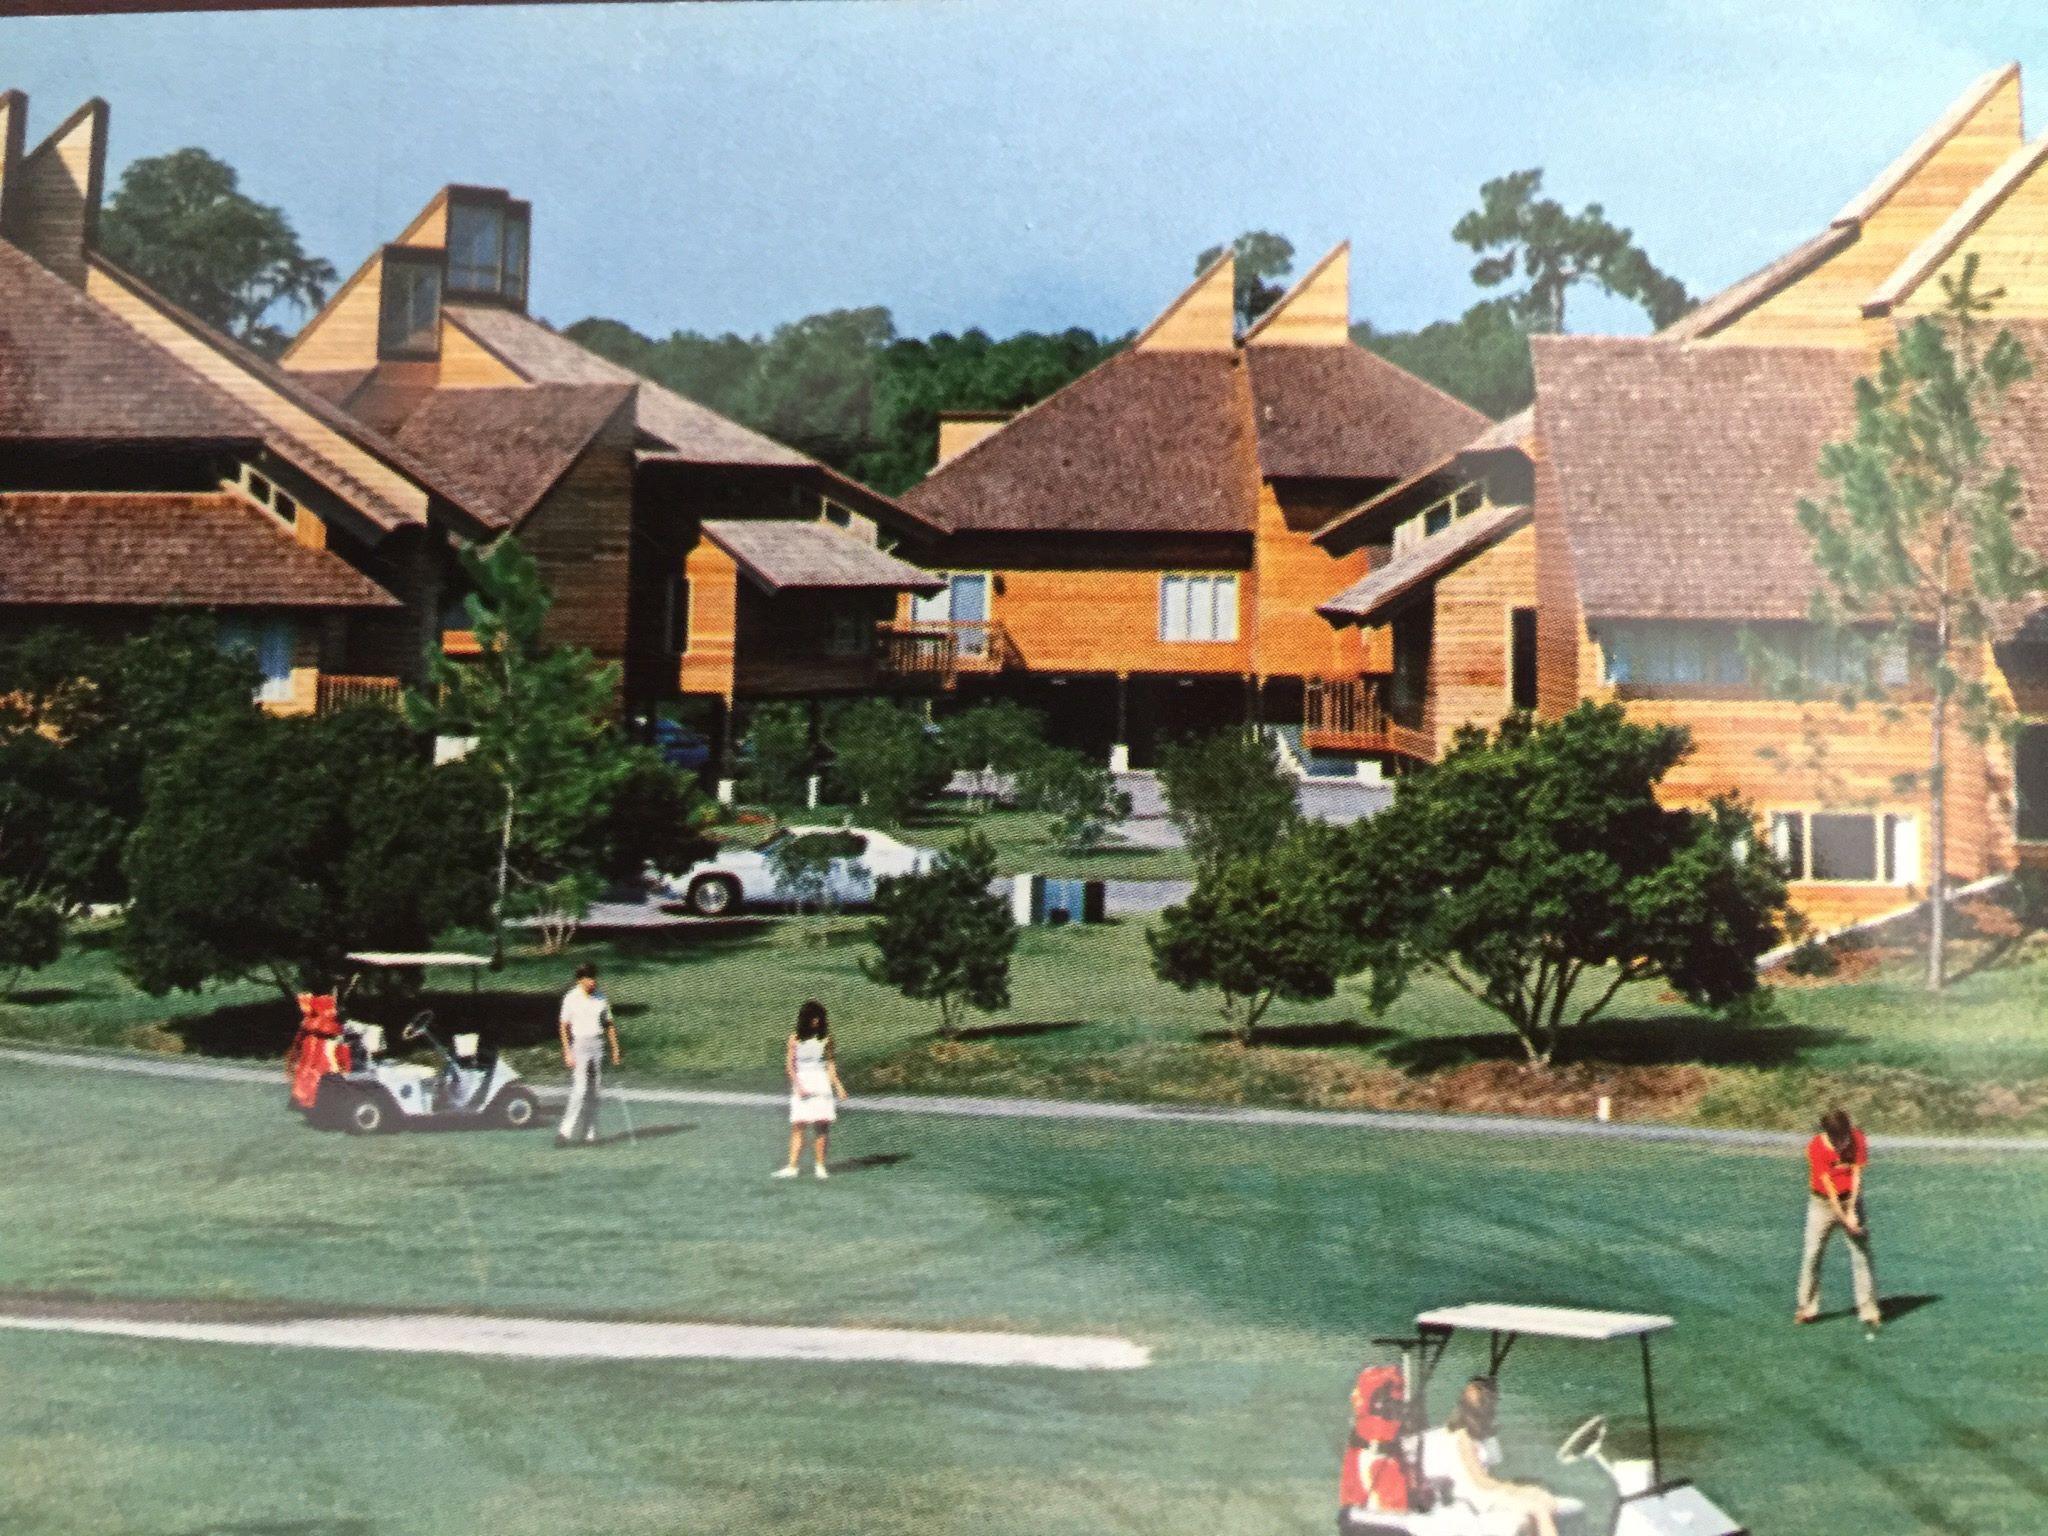 Walt Disney World's Fairway Villas now known as Saratoga